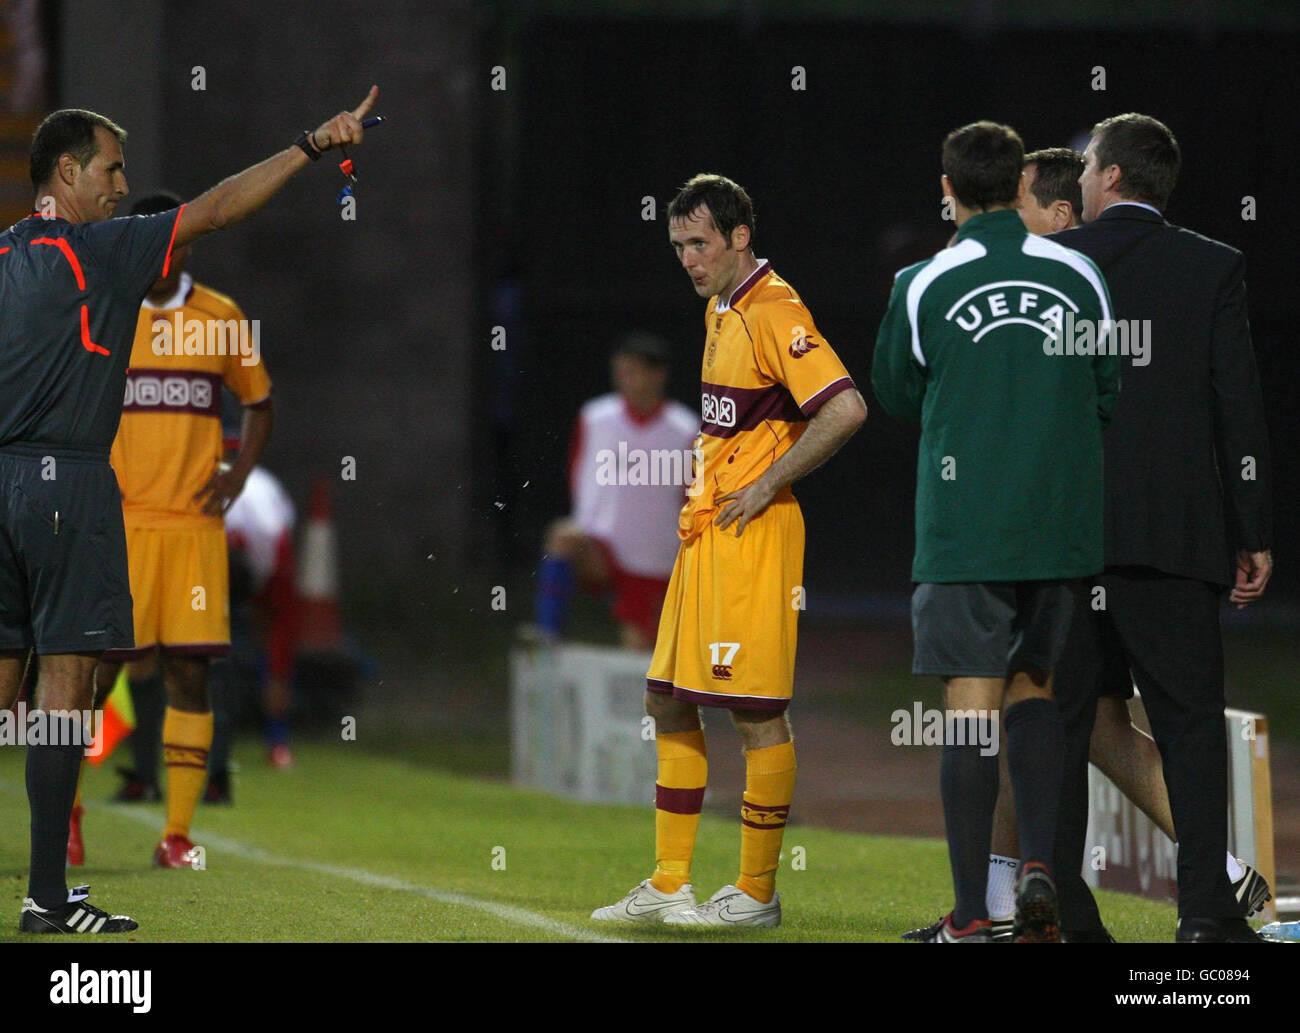 Soccer - Europa League - Third Round Qualifying - Leg Two - Motherwell v Steaua Bucharest - Fir Park Stock Photo